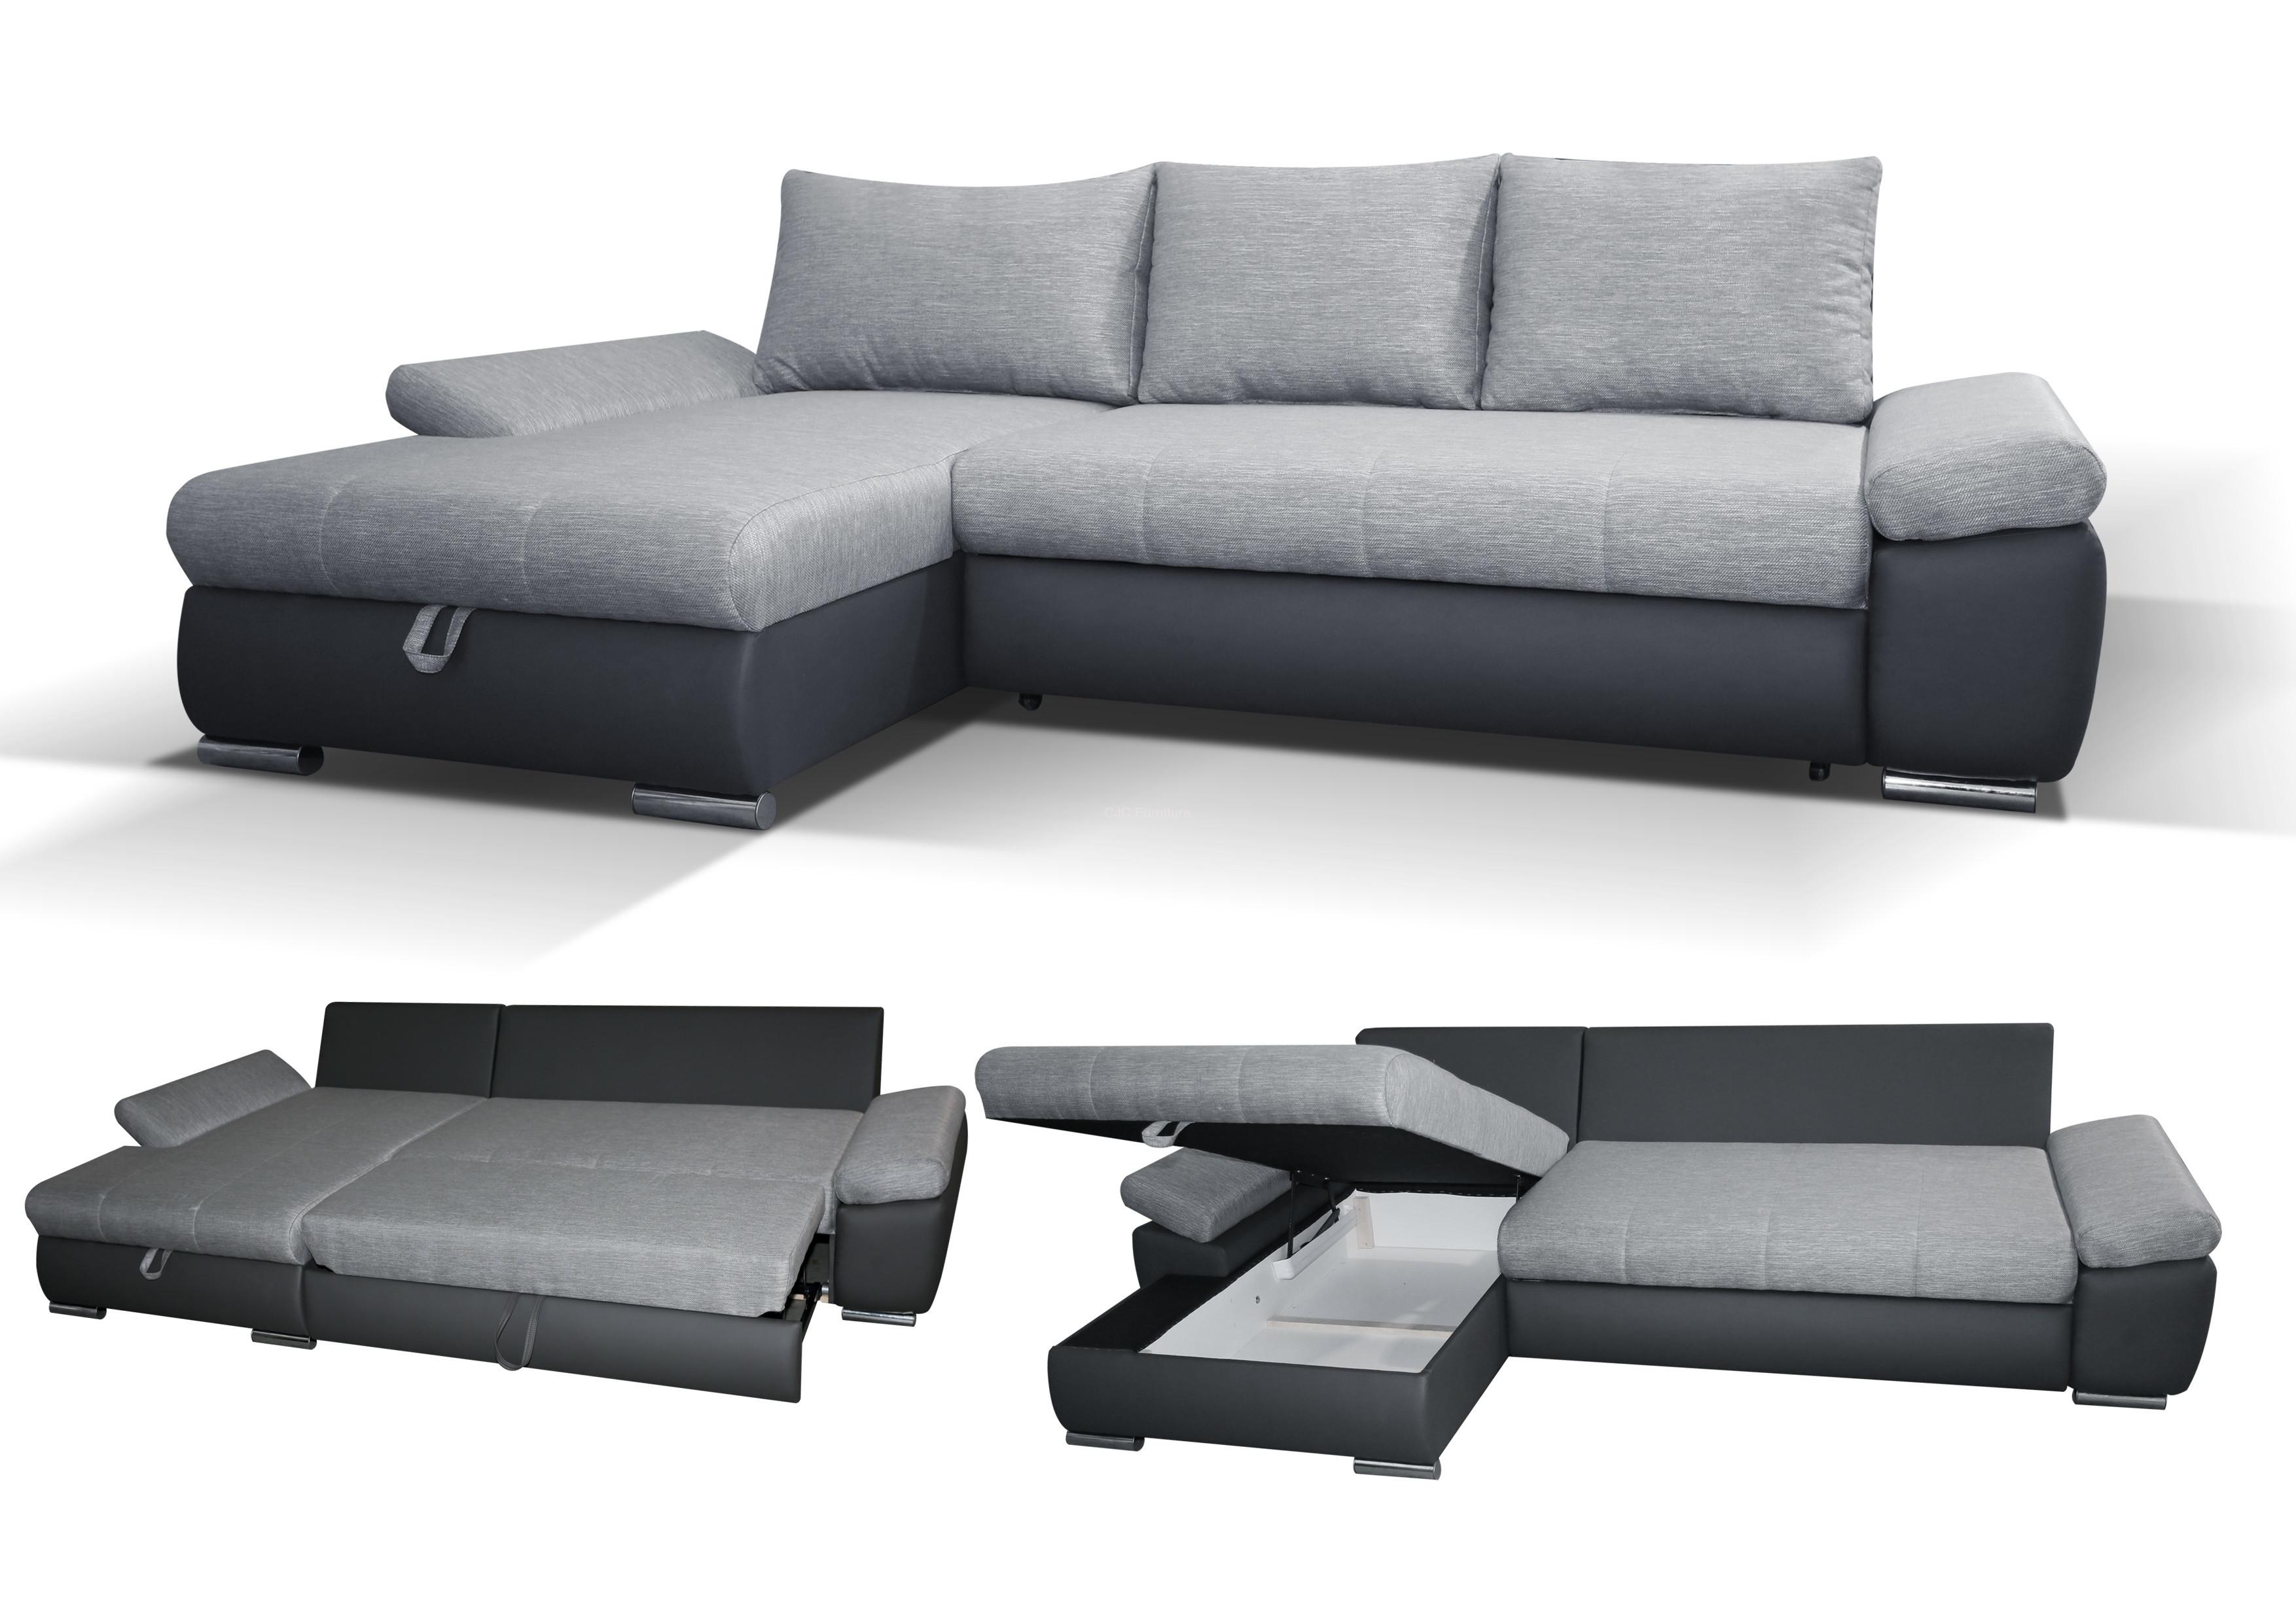 caserto corner sofa bed - left handed PMKFBEQ